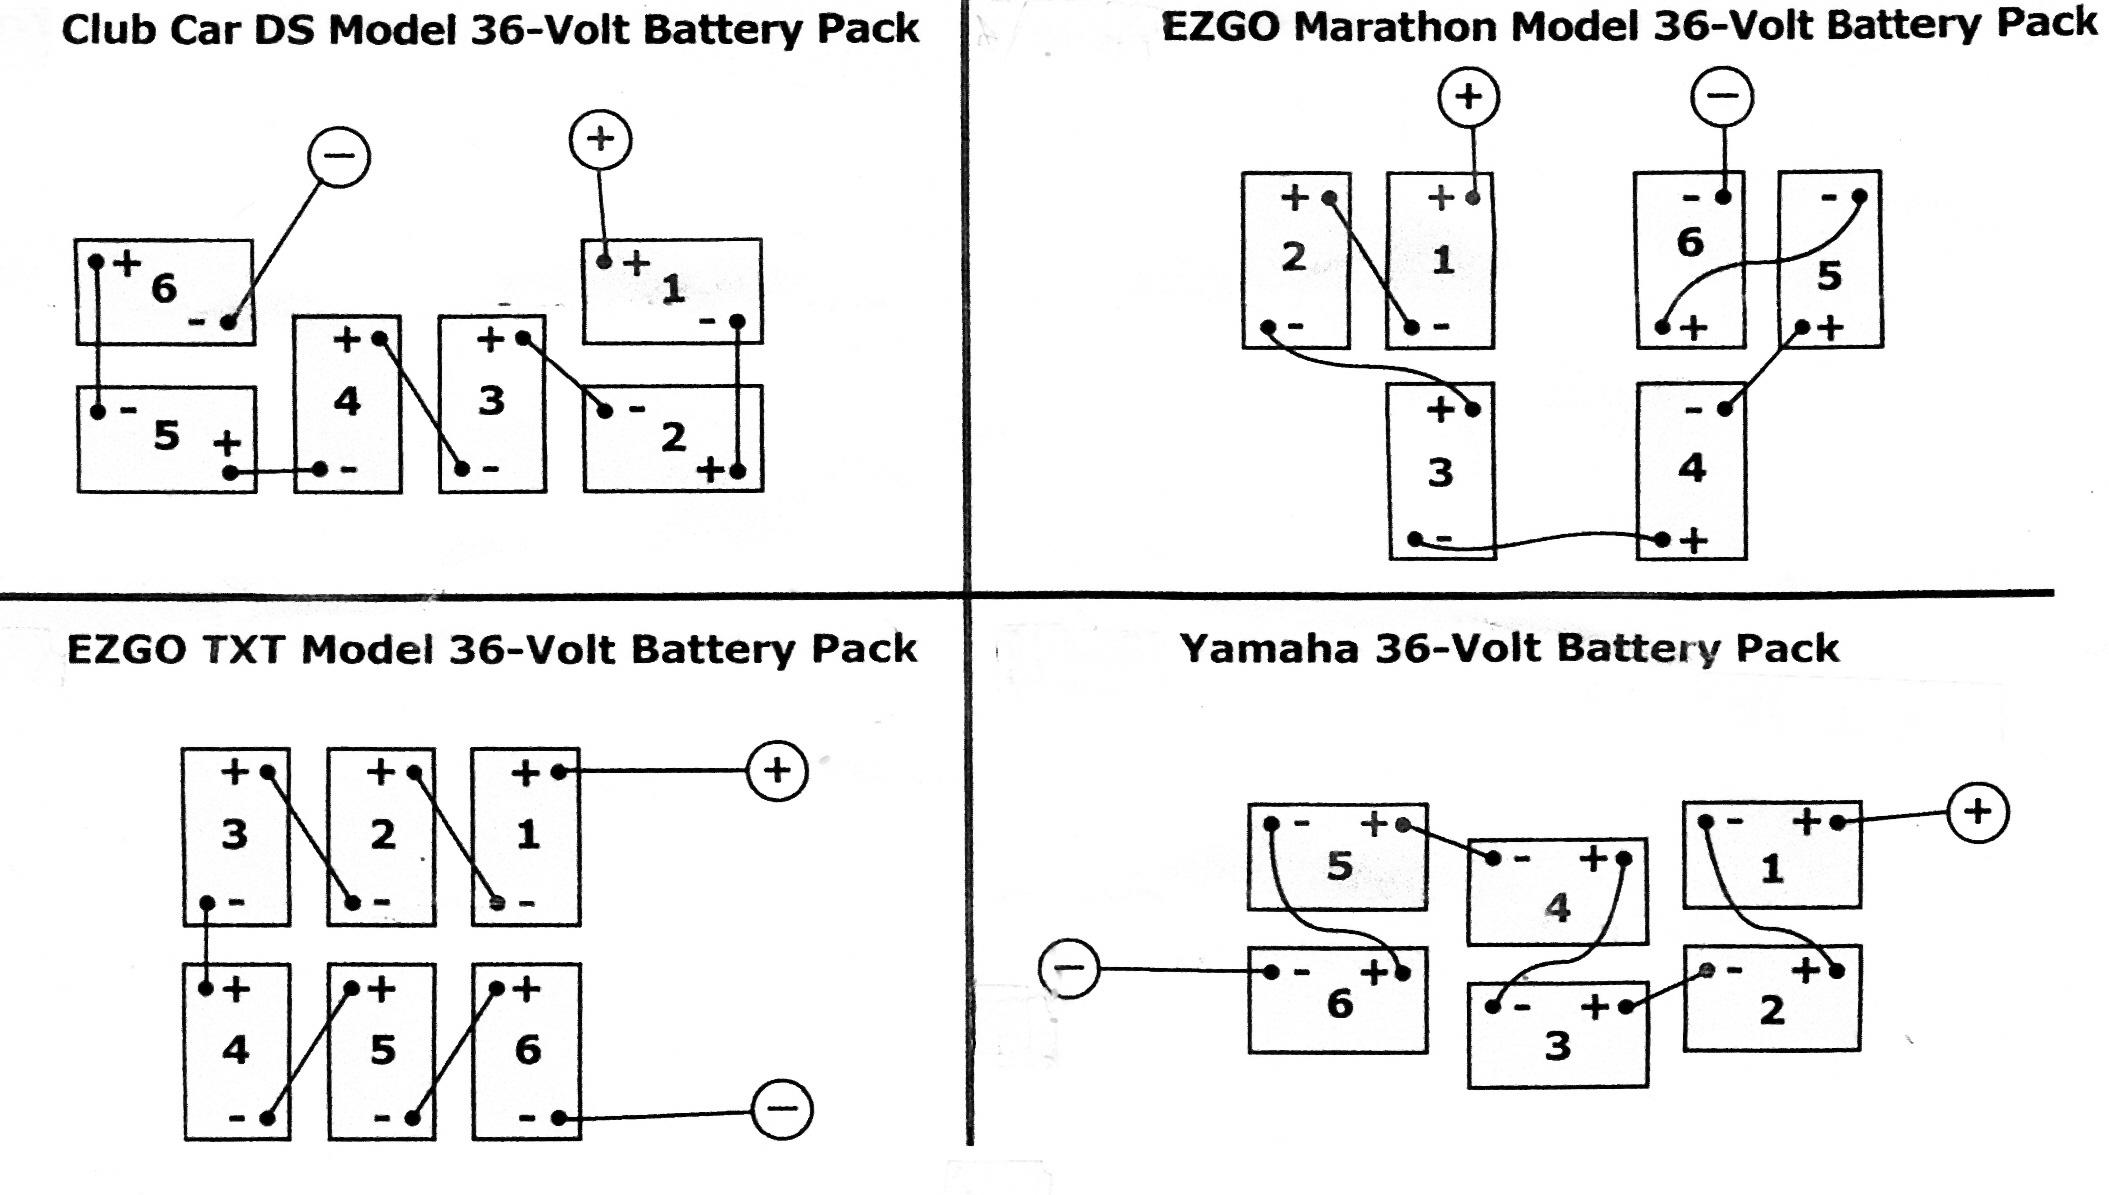 ZF_7717] Club Car Wiring Diagram 48 Volt Batteries Furthermore Ezgo Golf  Cart Wiring DiagramViewor Gritea Mohammedshrine Librar Wiring 101